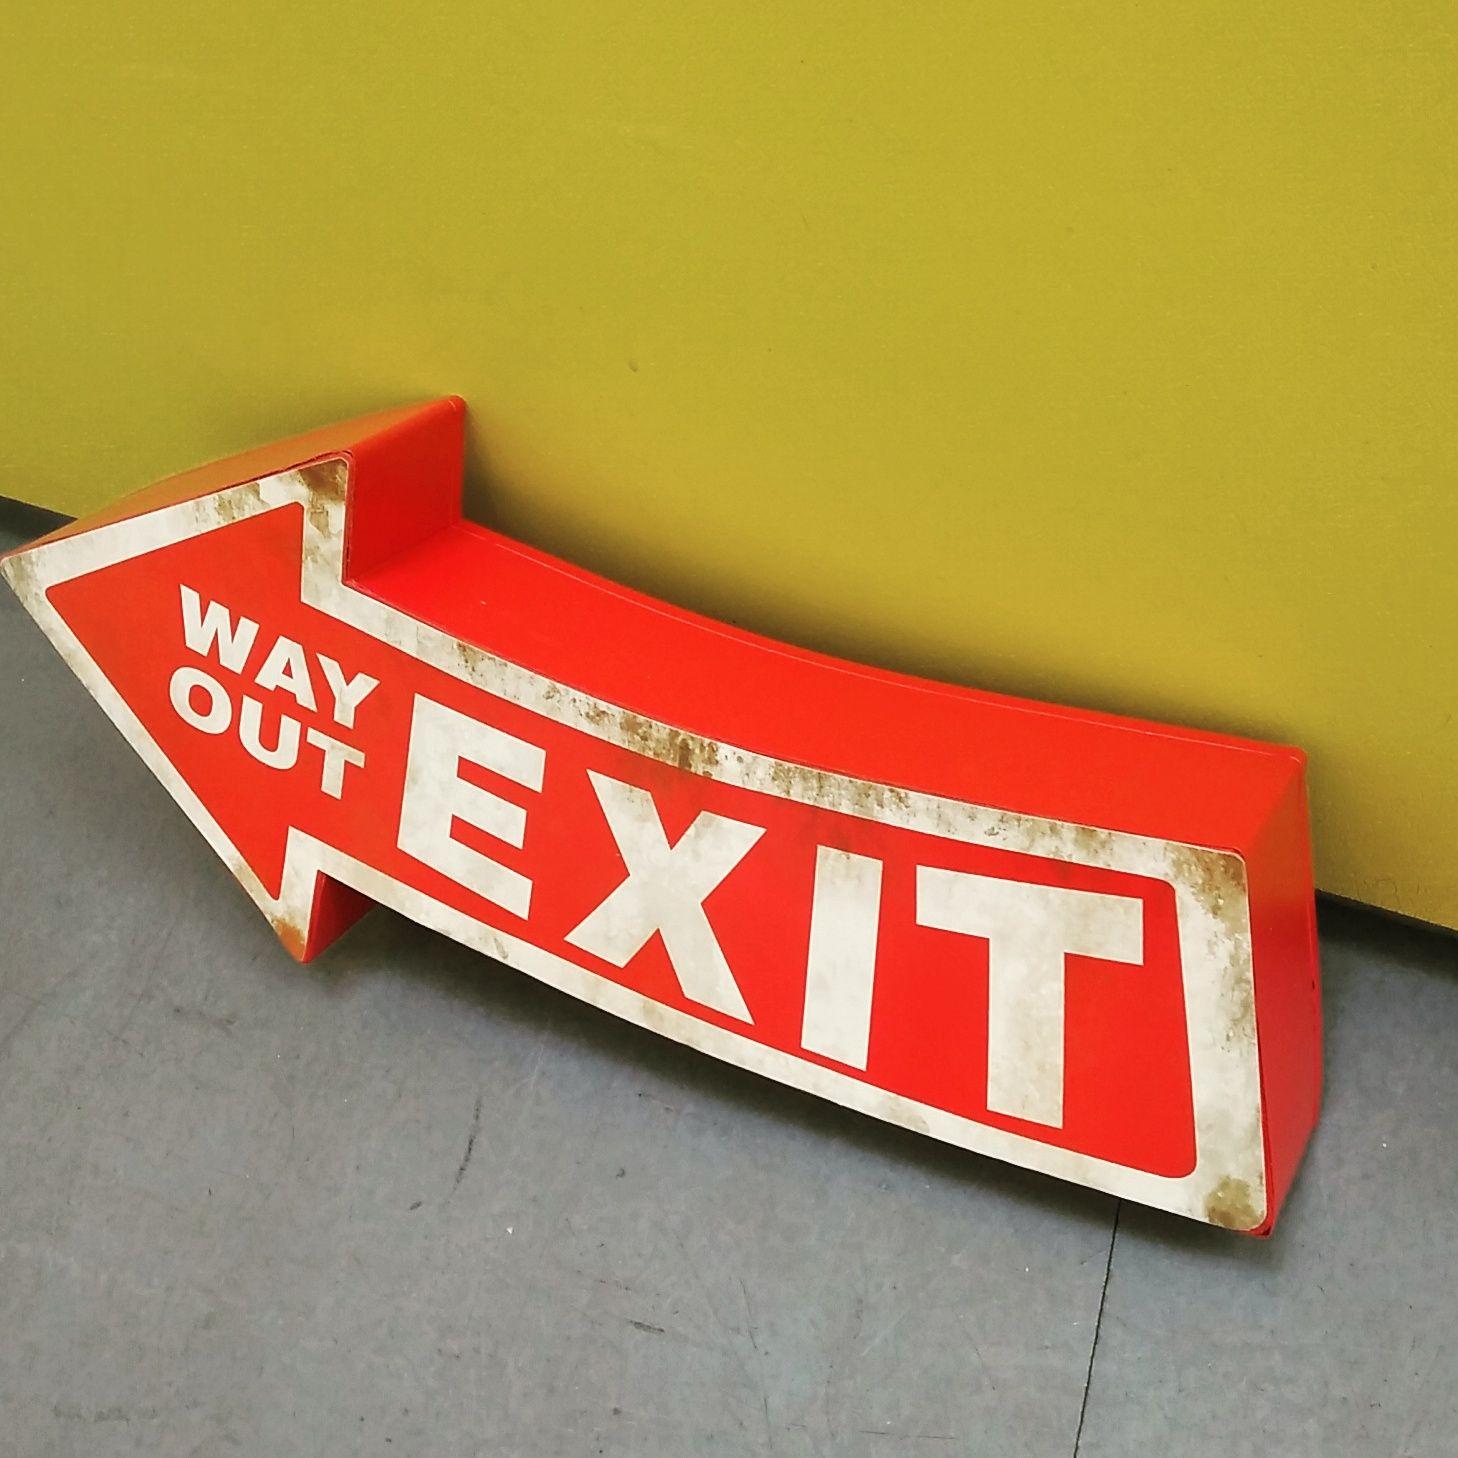 Exit Wayout Wallsign Metal Arrow Metallschild Pfeil Ausgang